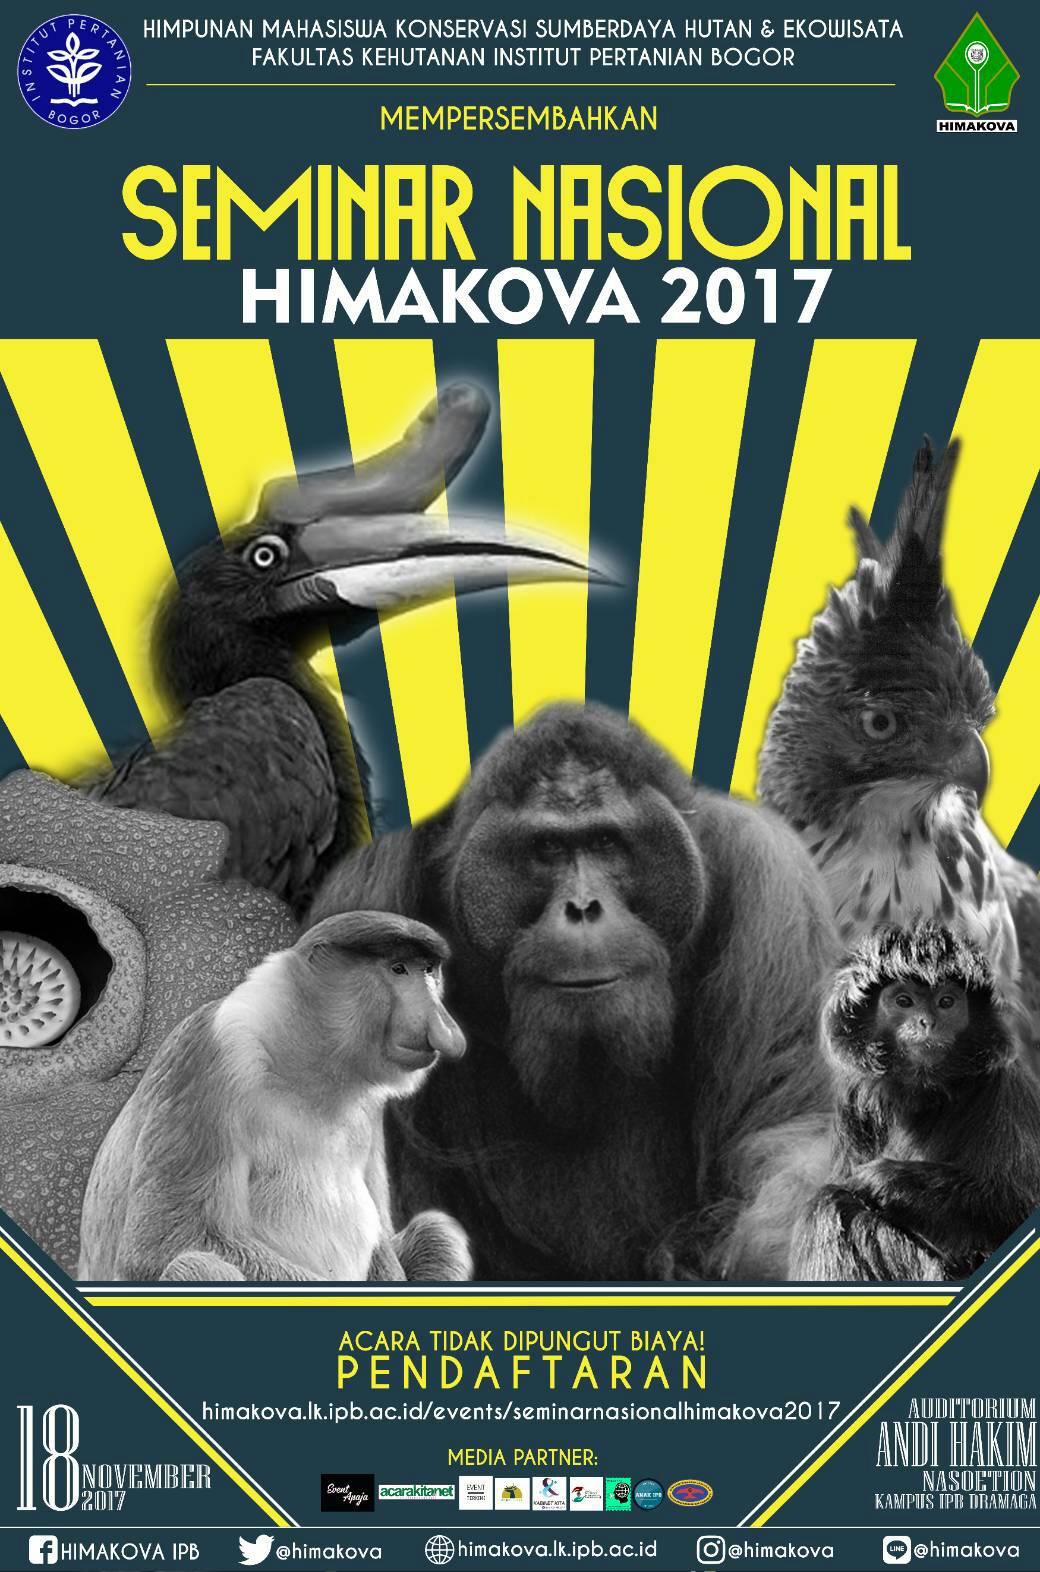 Seminar Nasional Himakova 2017